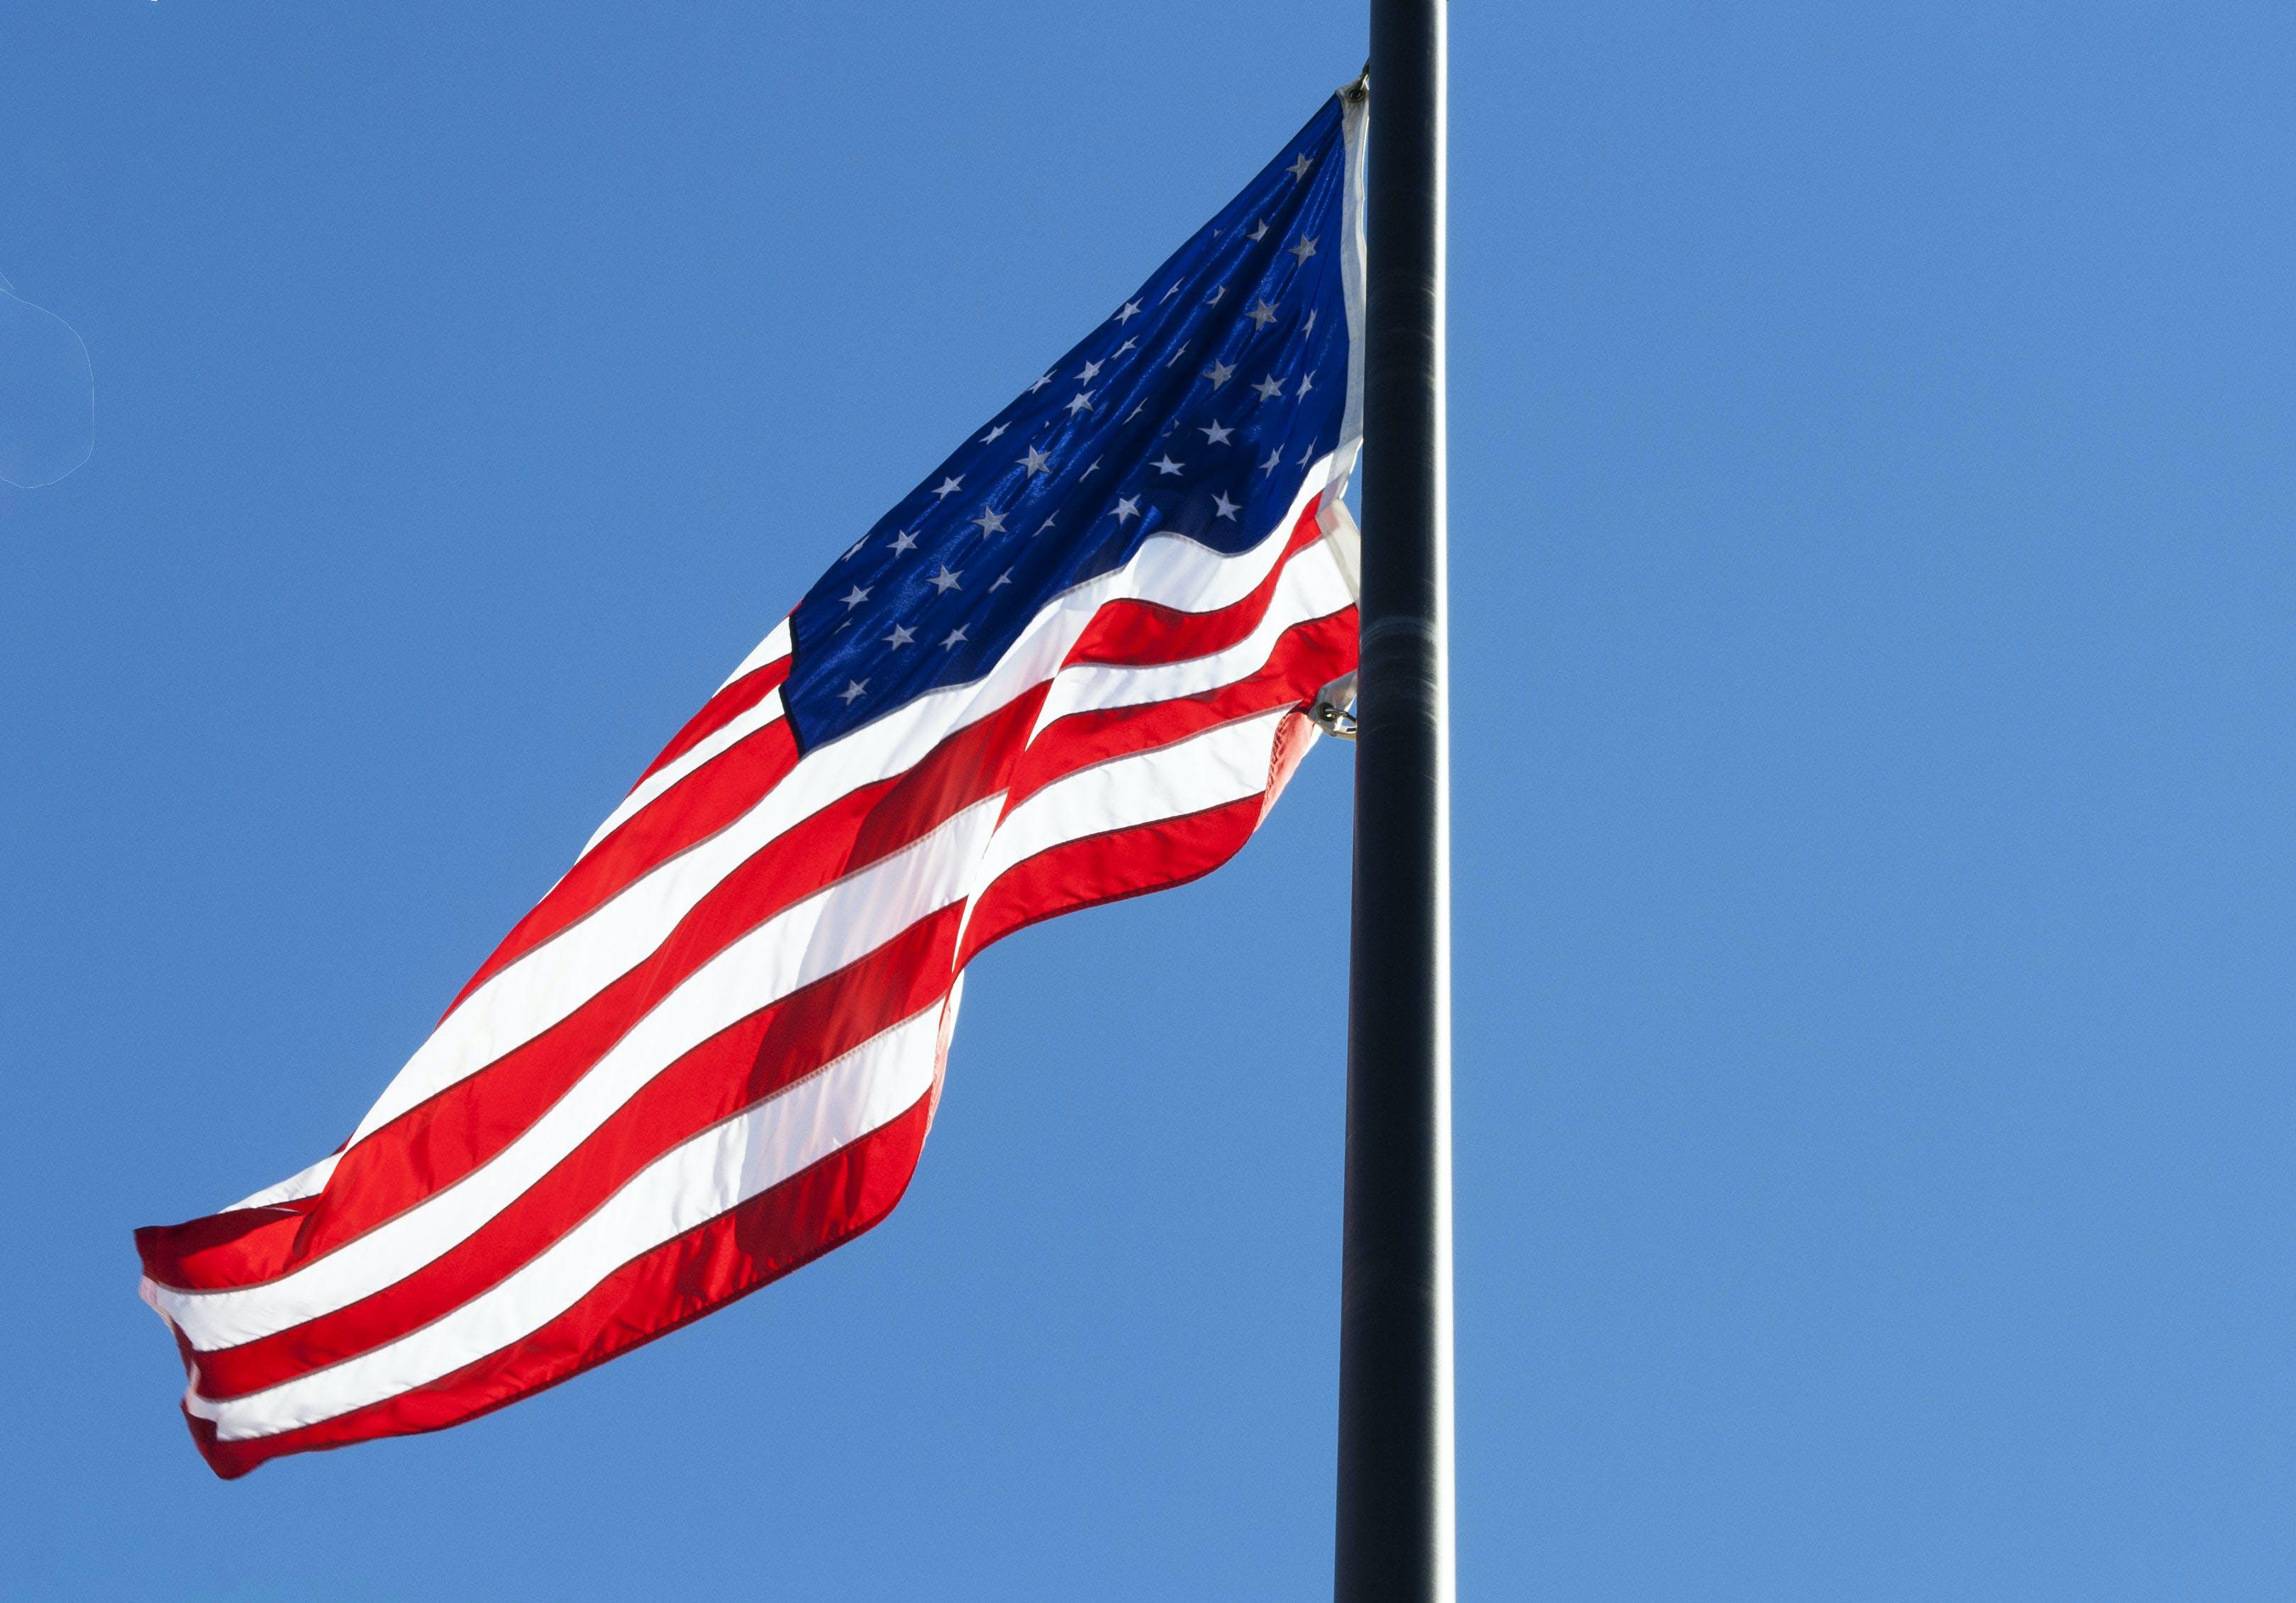 Kostenloses Stock Foto zu amerika, amerikanische flagge, banner, blau